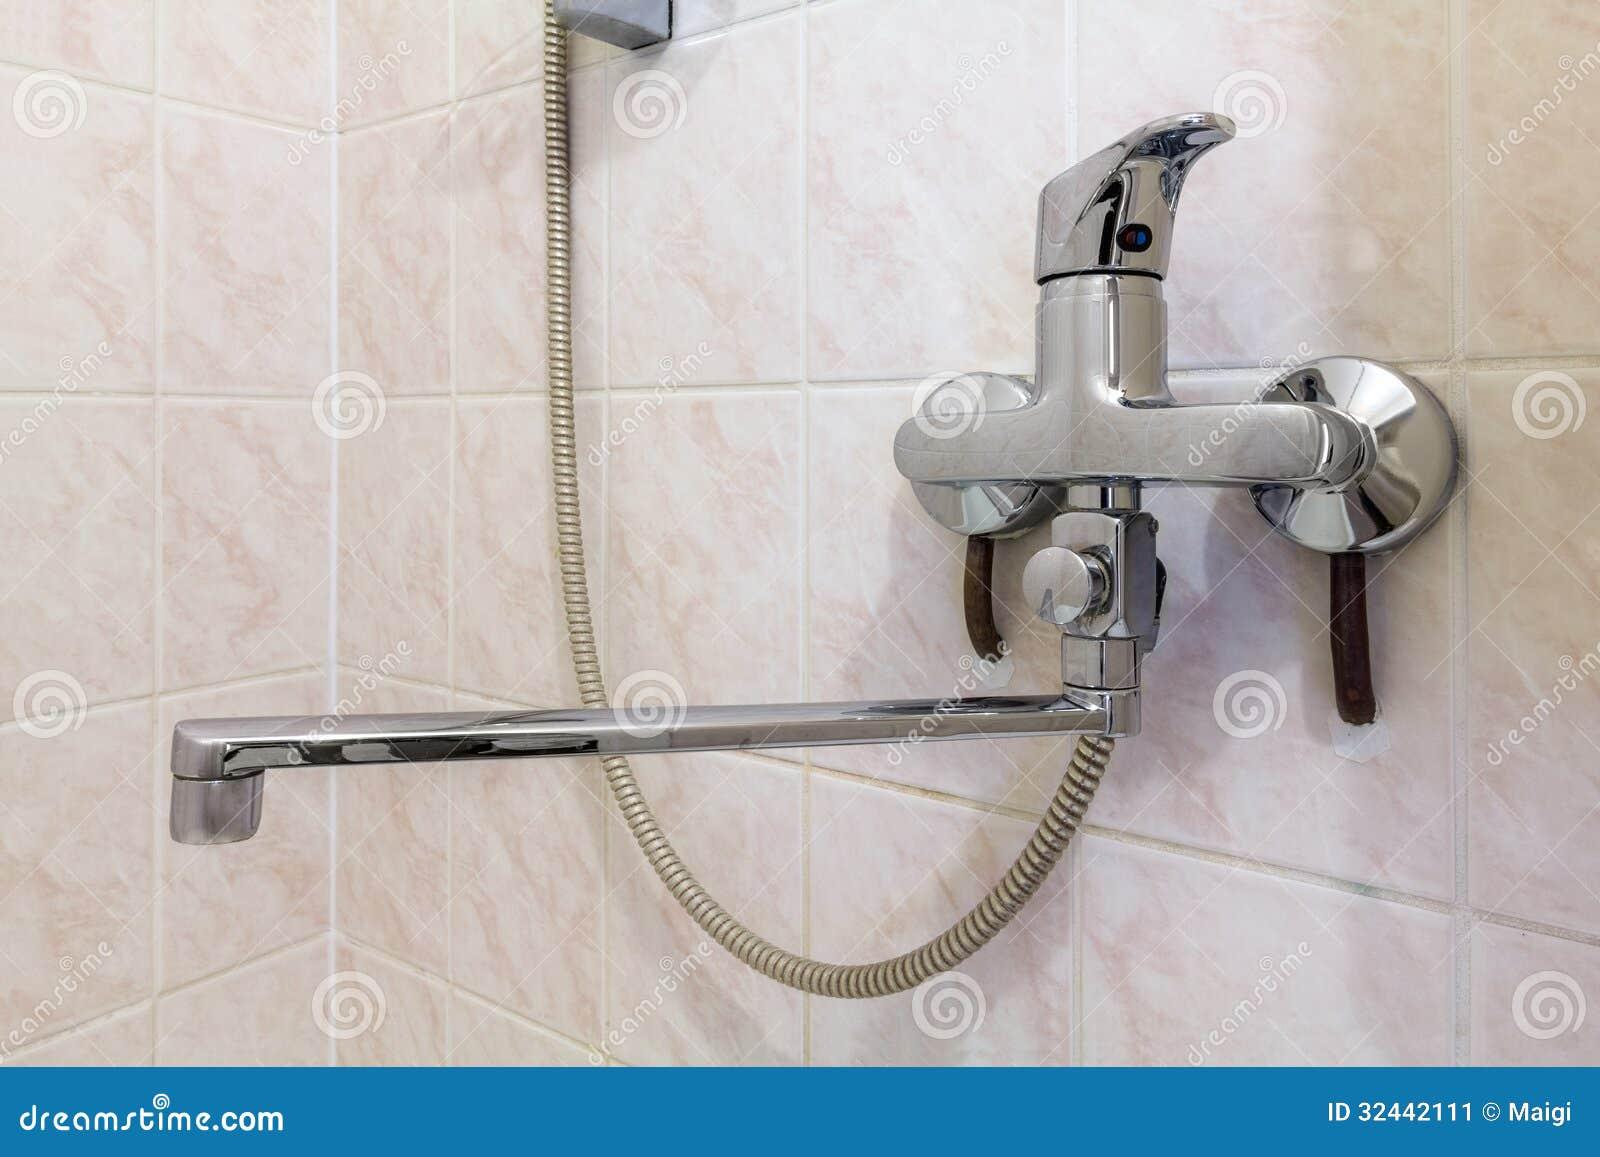 Download Shower Faucet stock image. Image of chrome, valve, bath - 32442111